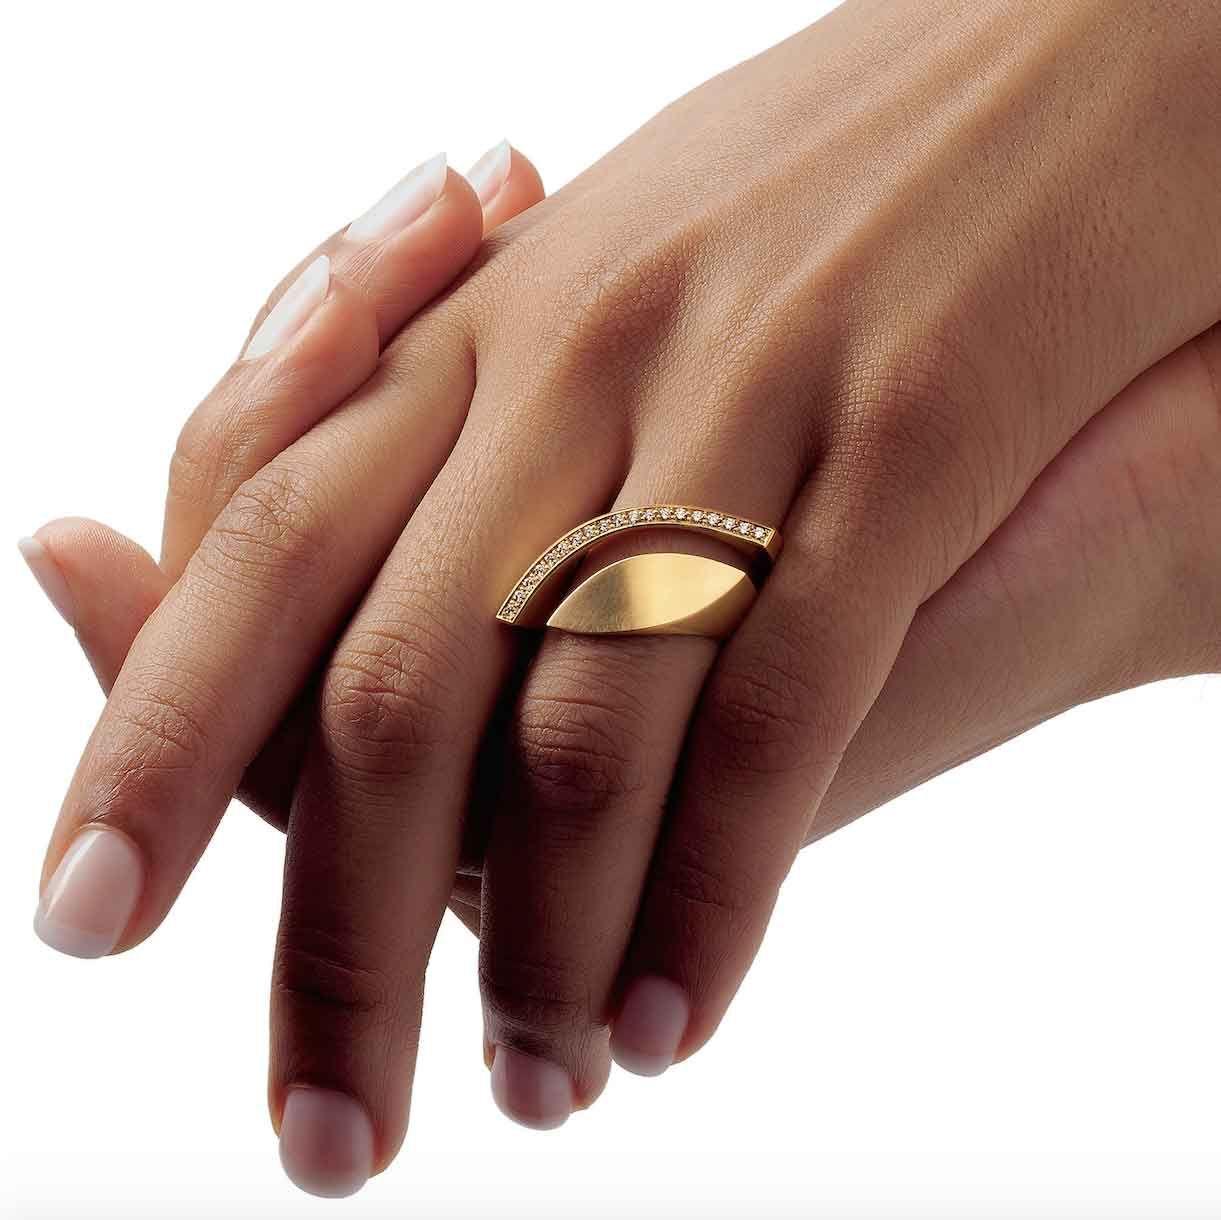 Elegant ORRO Contemporary Jewellery Glasgow Angela Hubel Gold Diamond Eye Ring brilliant cut diamonds